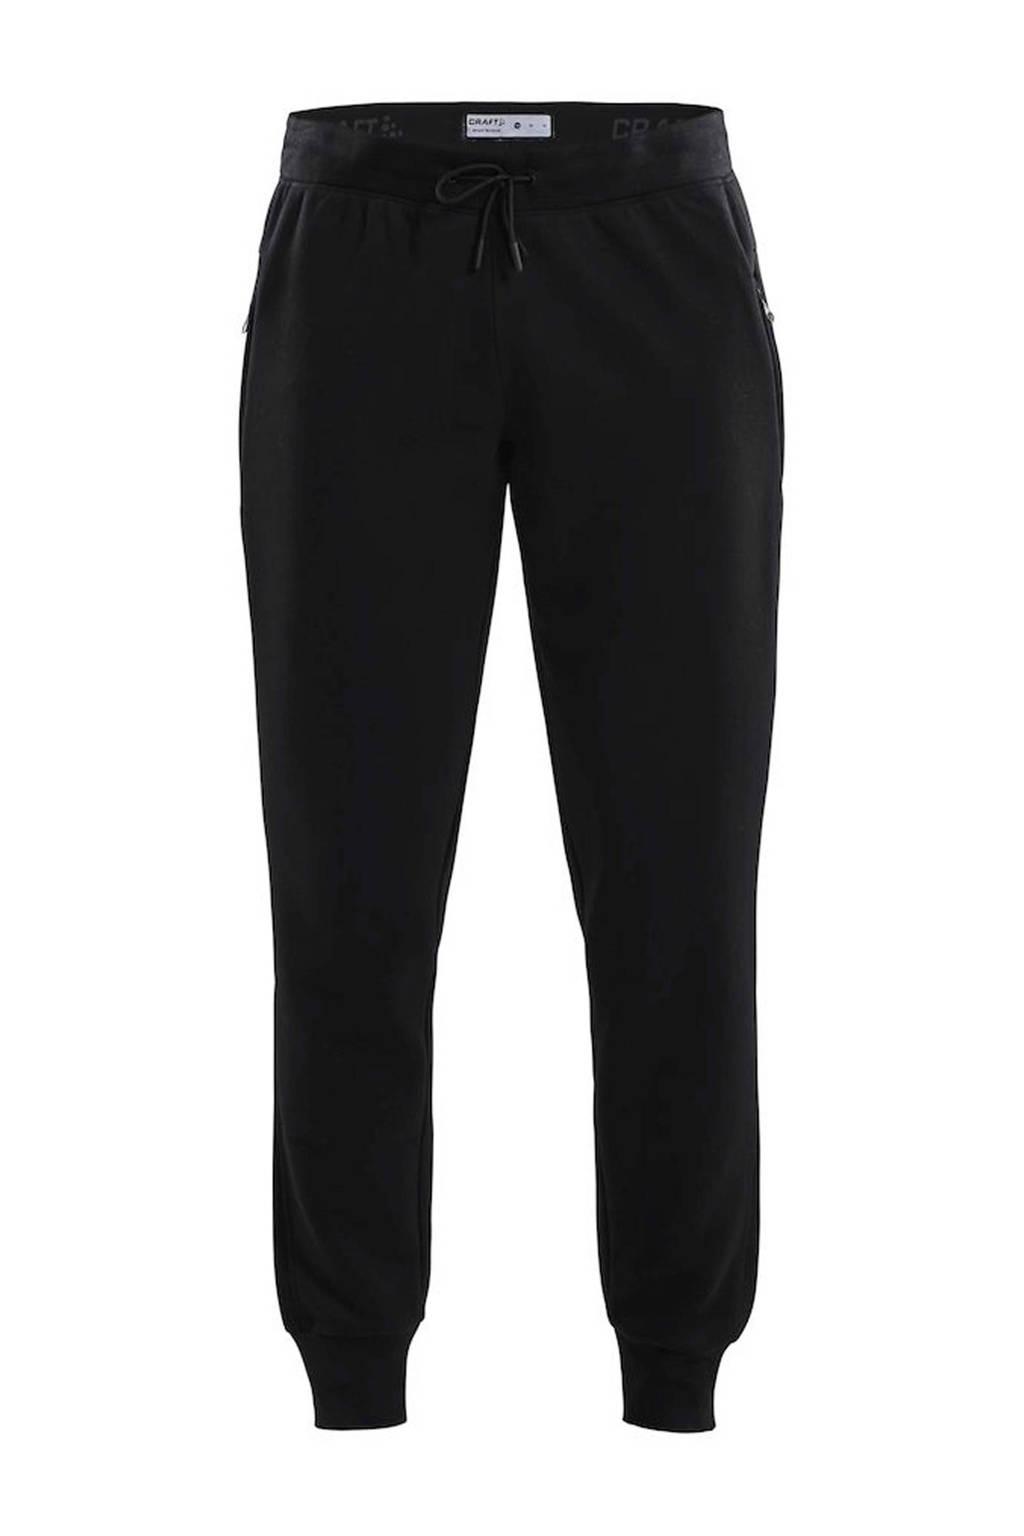 Craft joggingbroek zwart, Zwart